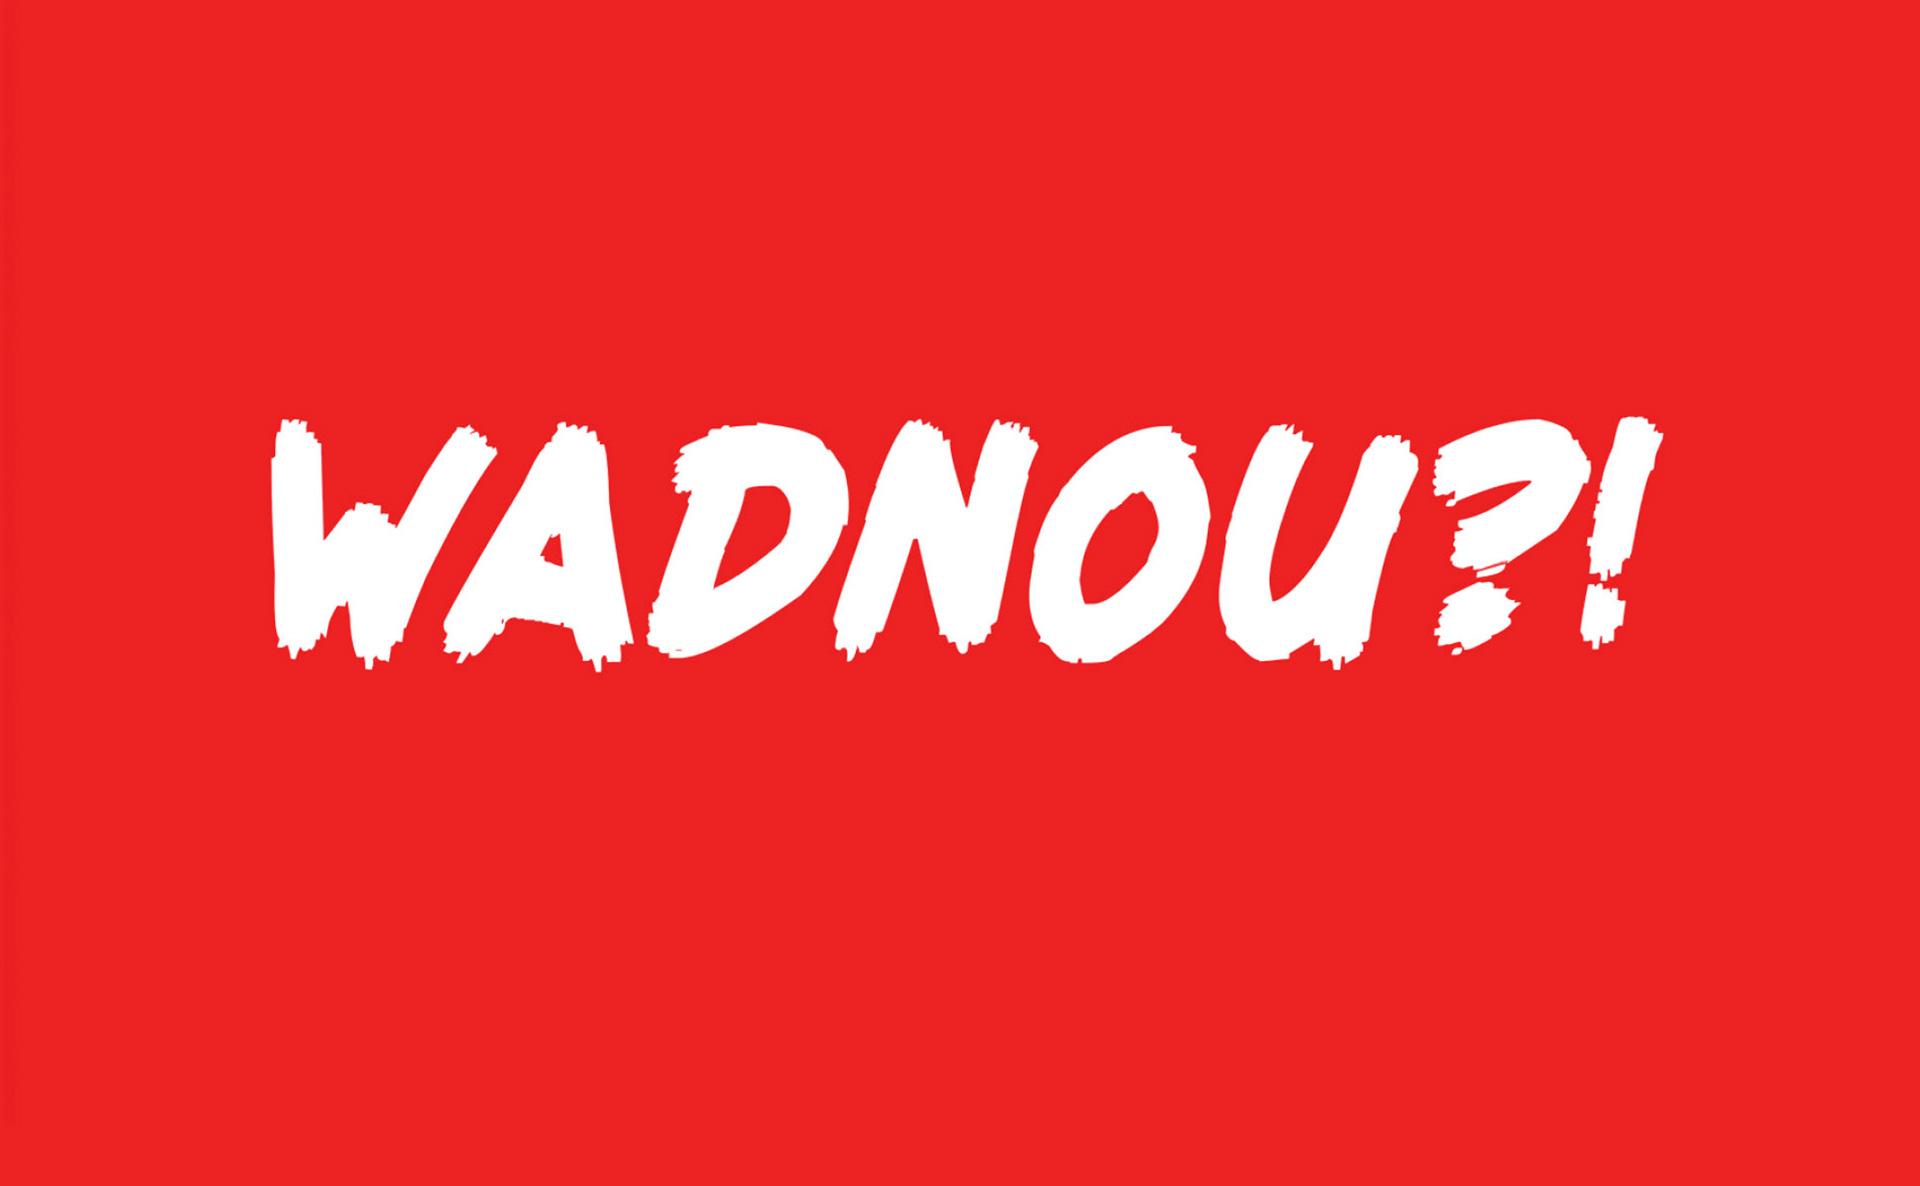 leconcepteur_tamara_pruis_wadnou_logo_design